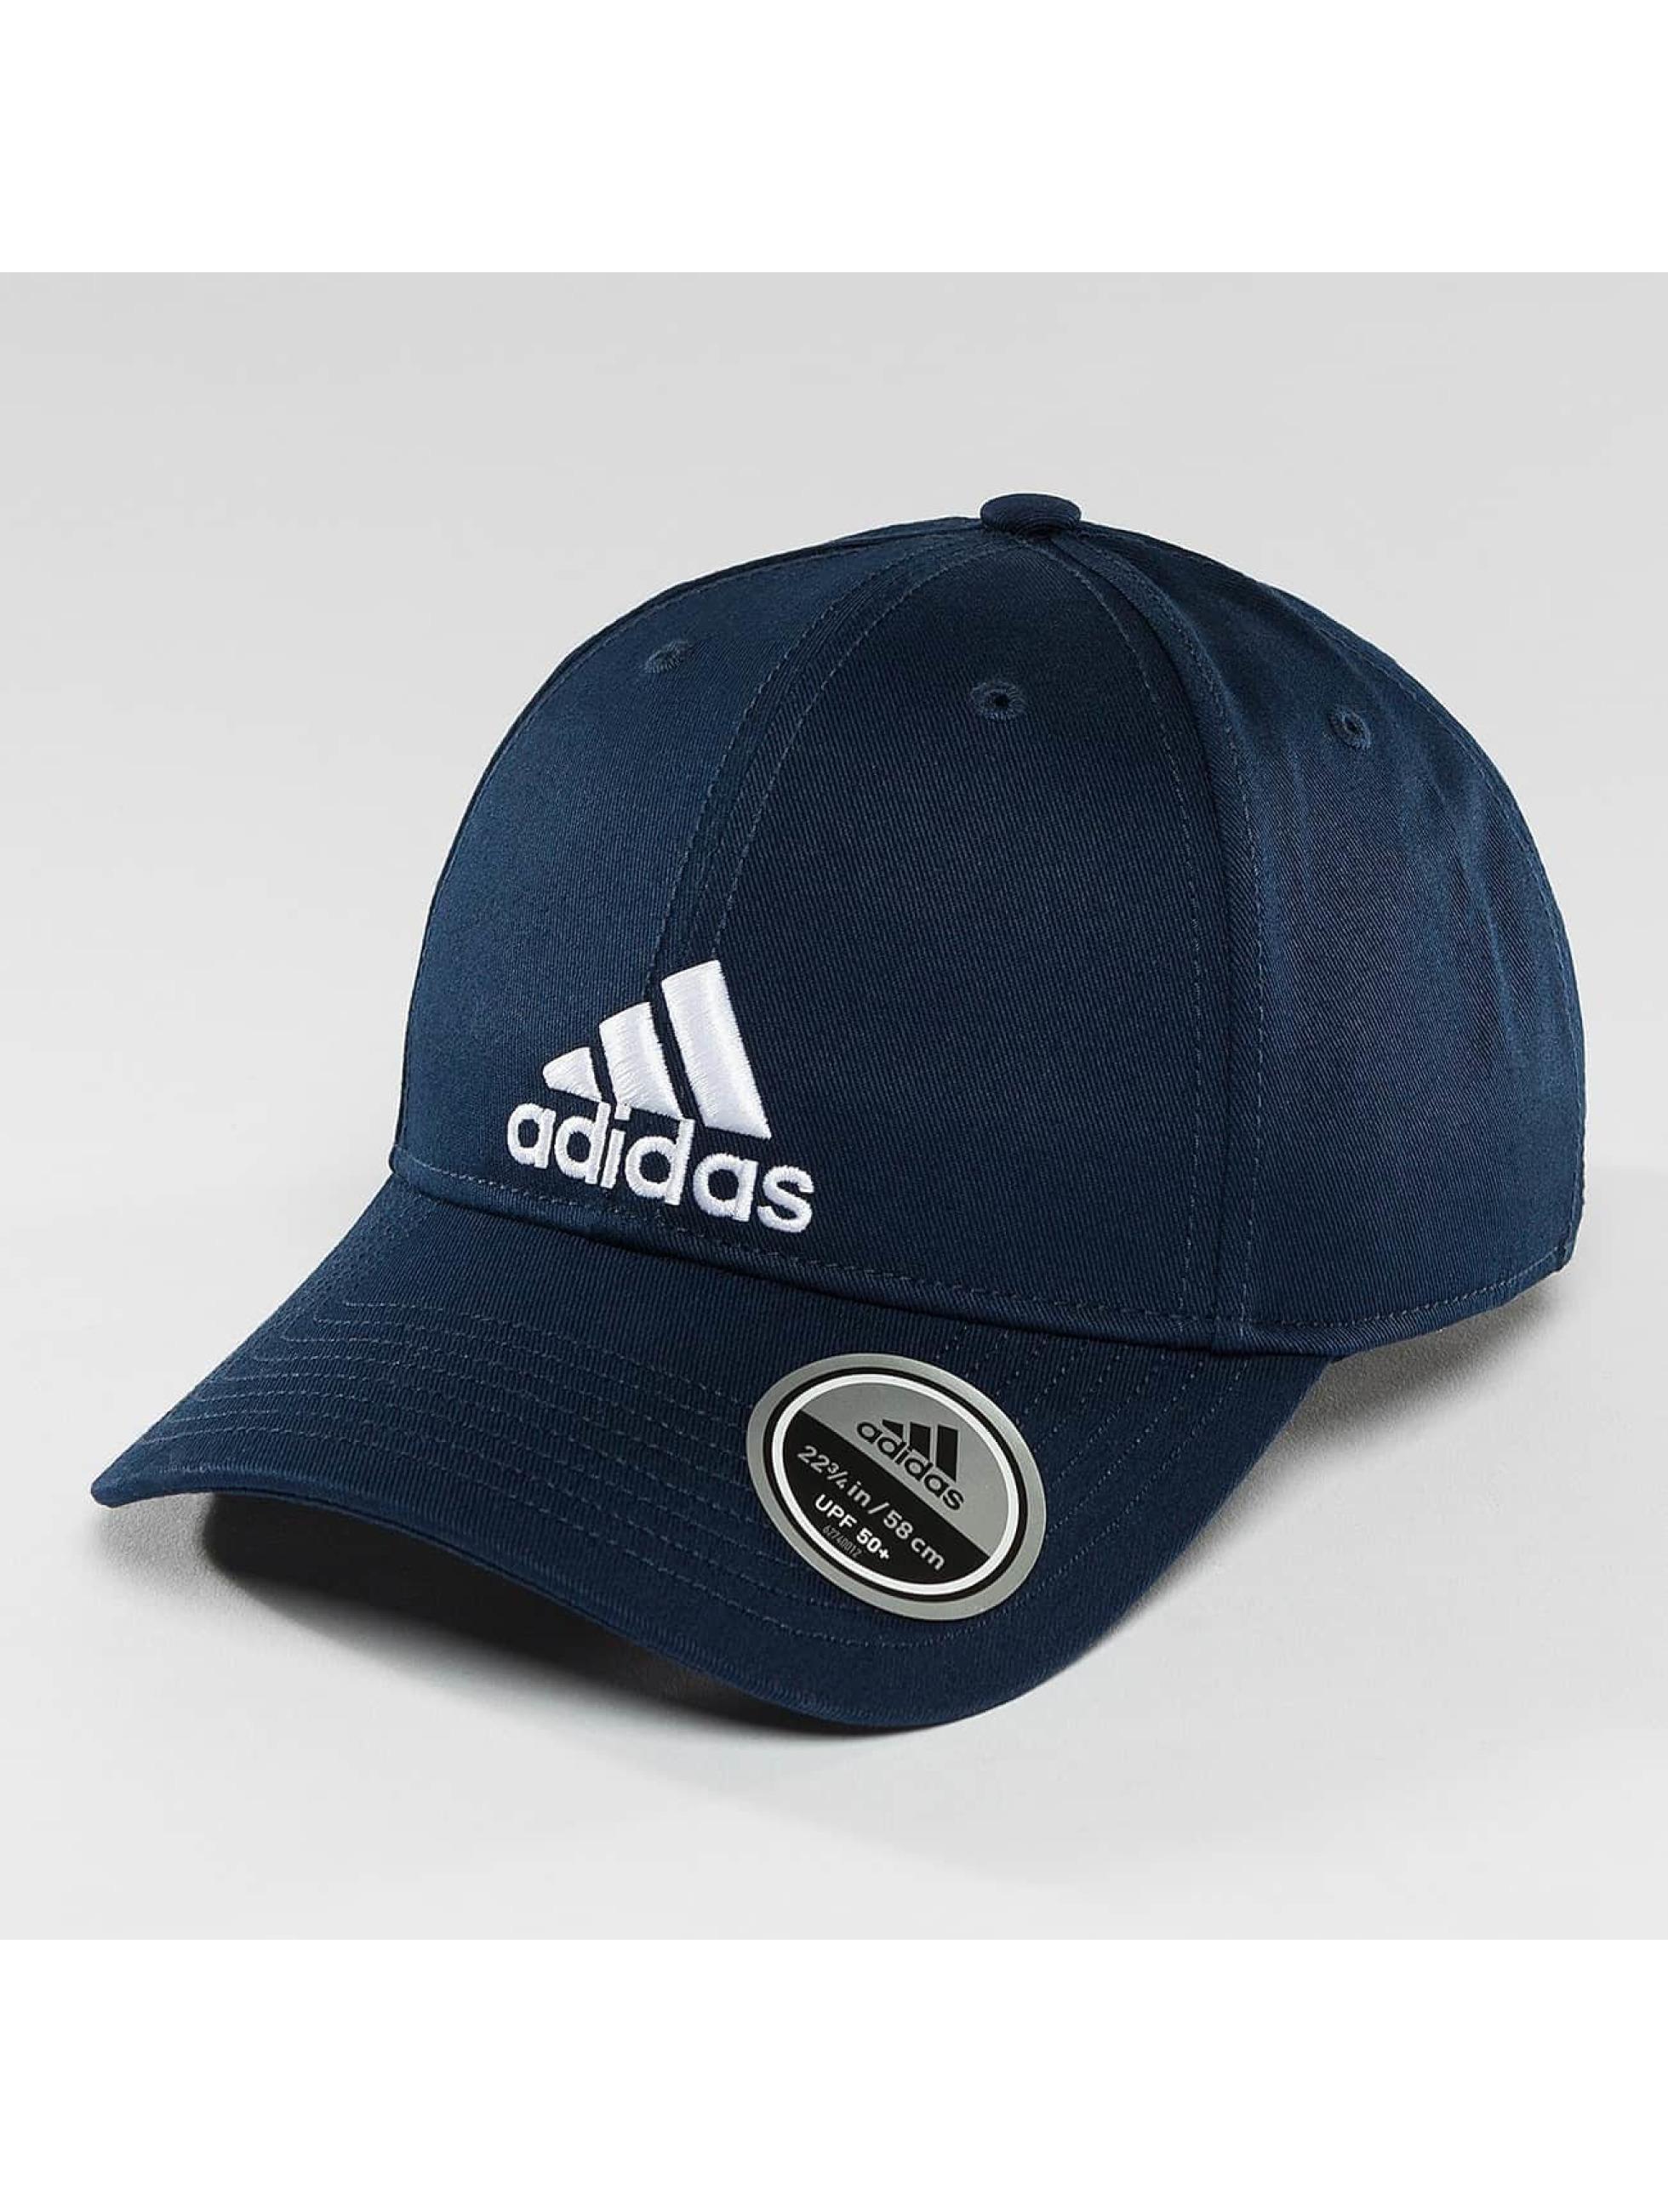 adidas Performance Casquette Snapback & Strapback Snapback Cap bleu